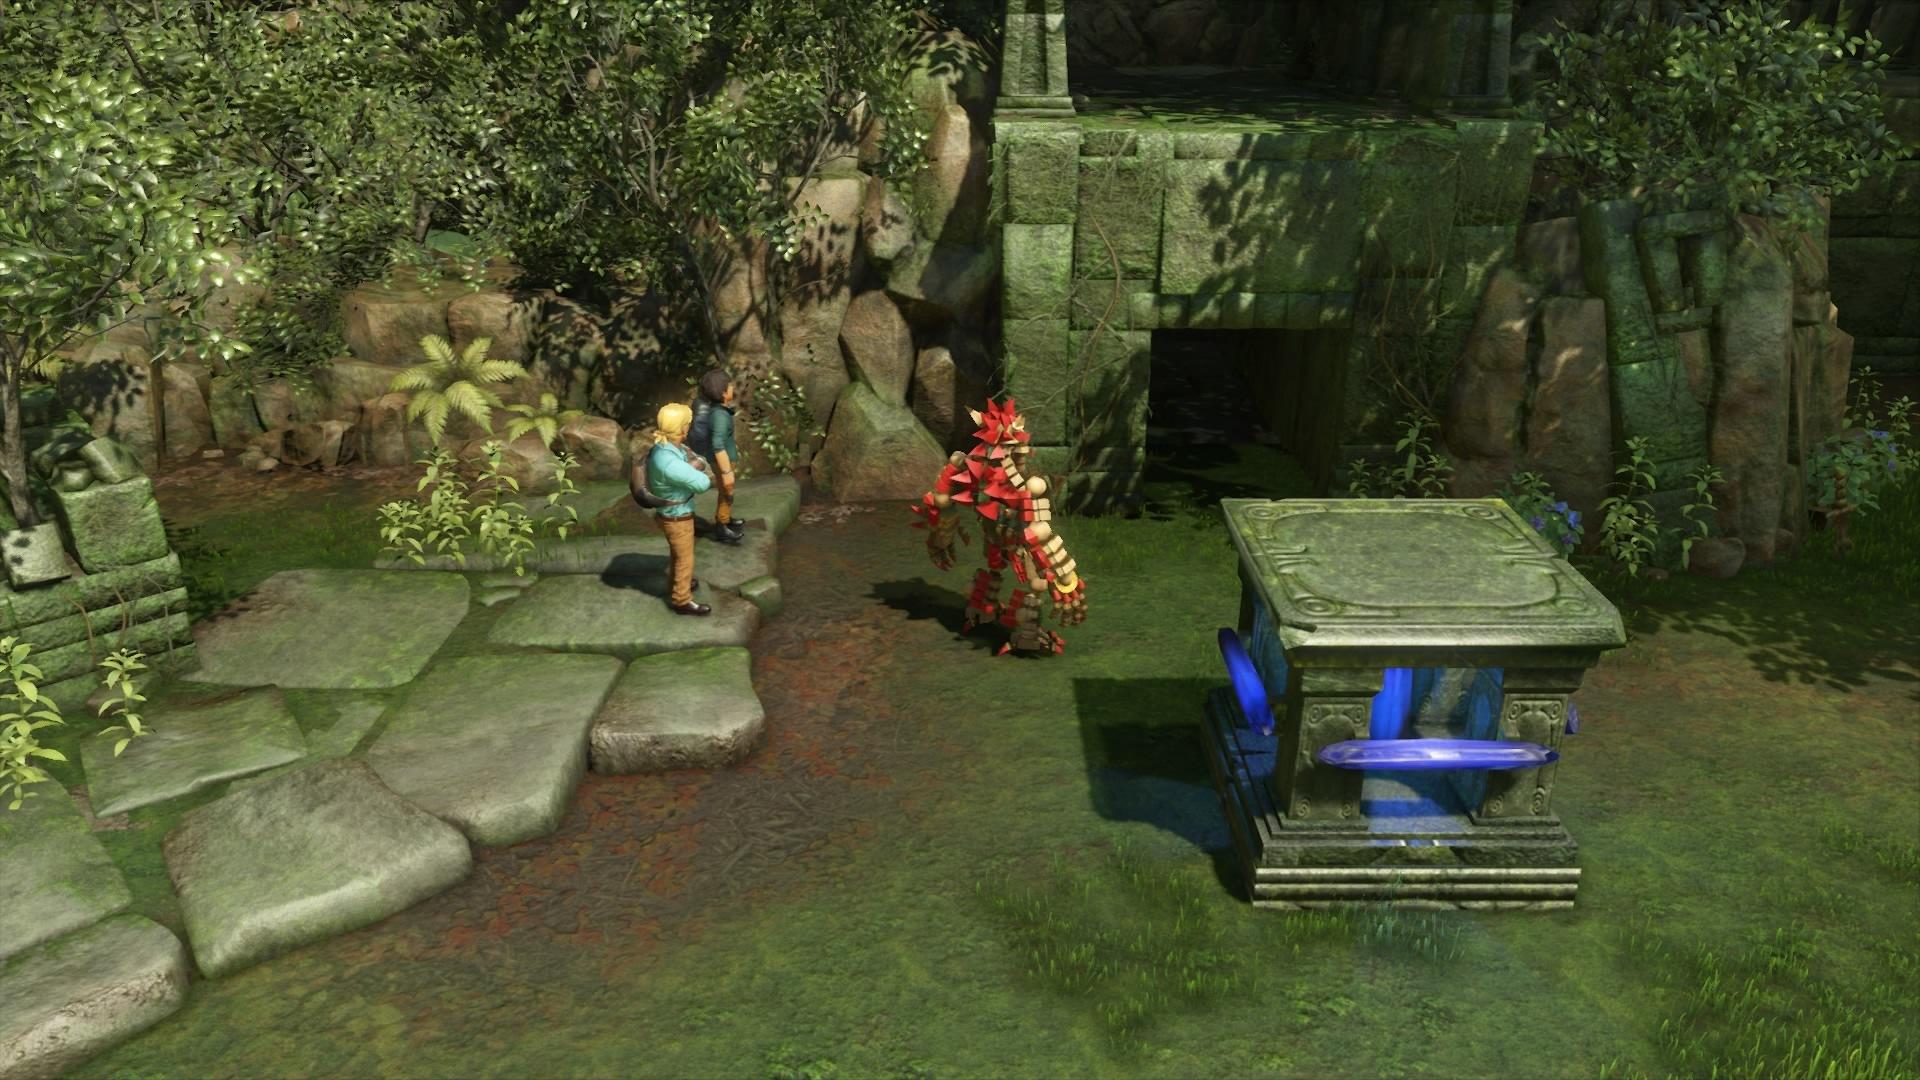 KNACK ふたりの英雄と古代兵団® 2-2 森に潜むもの-1